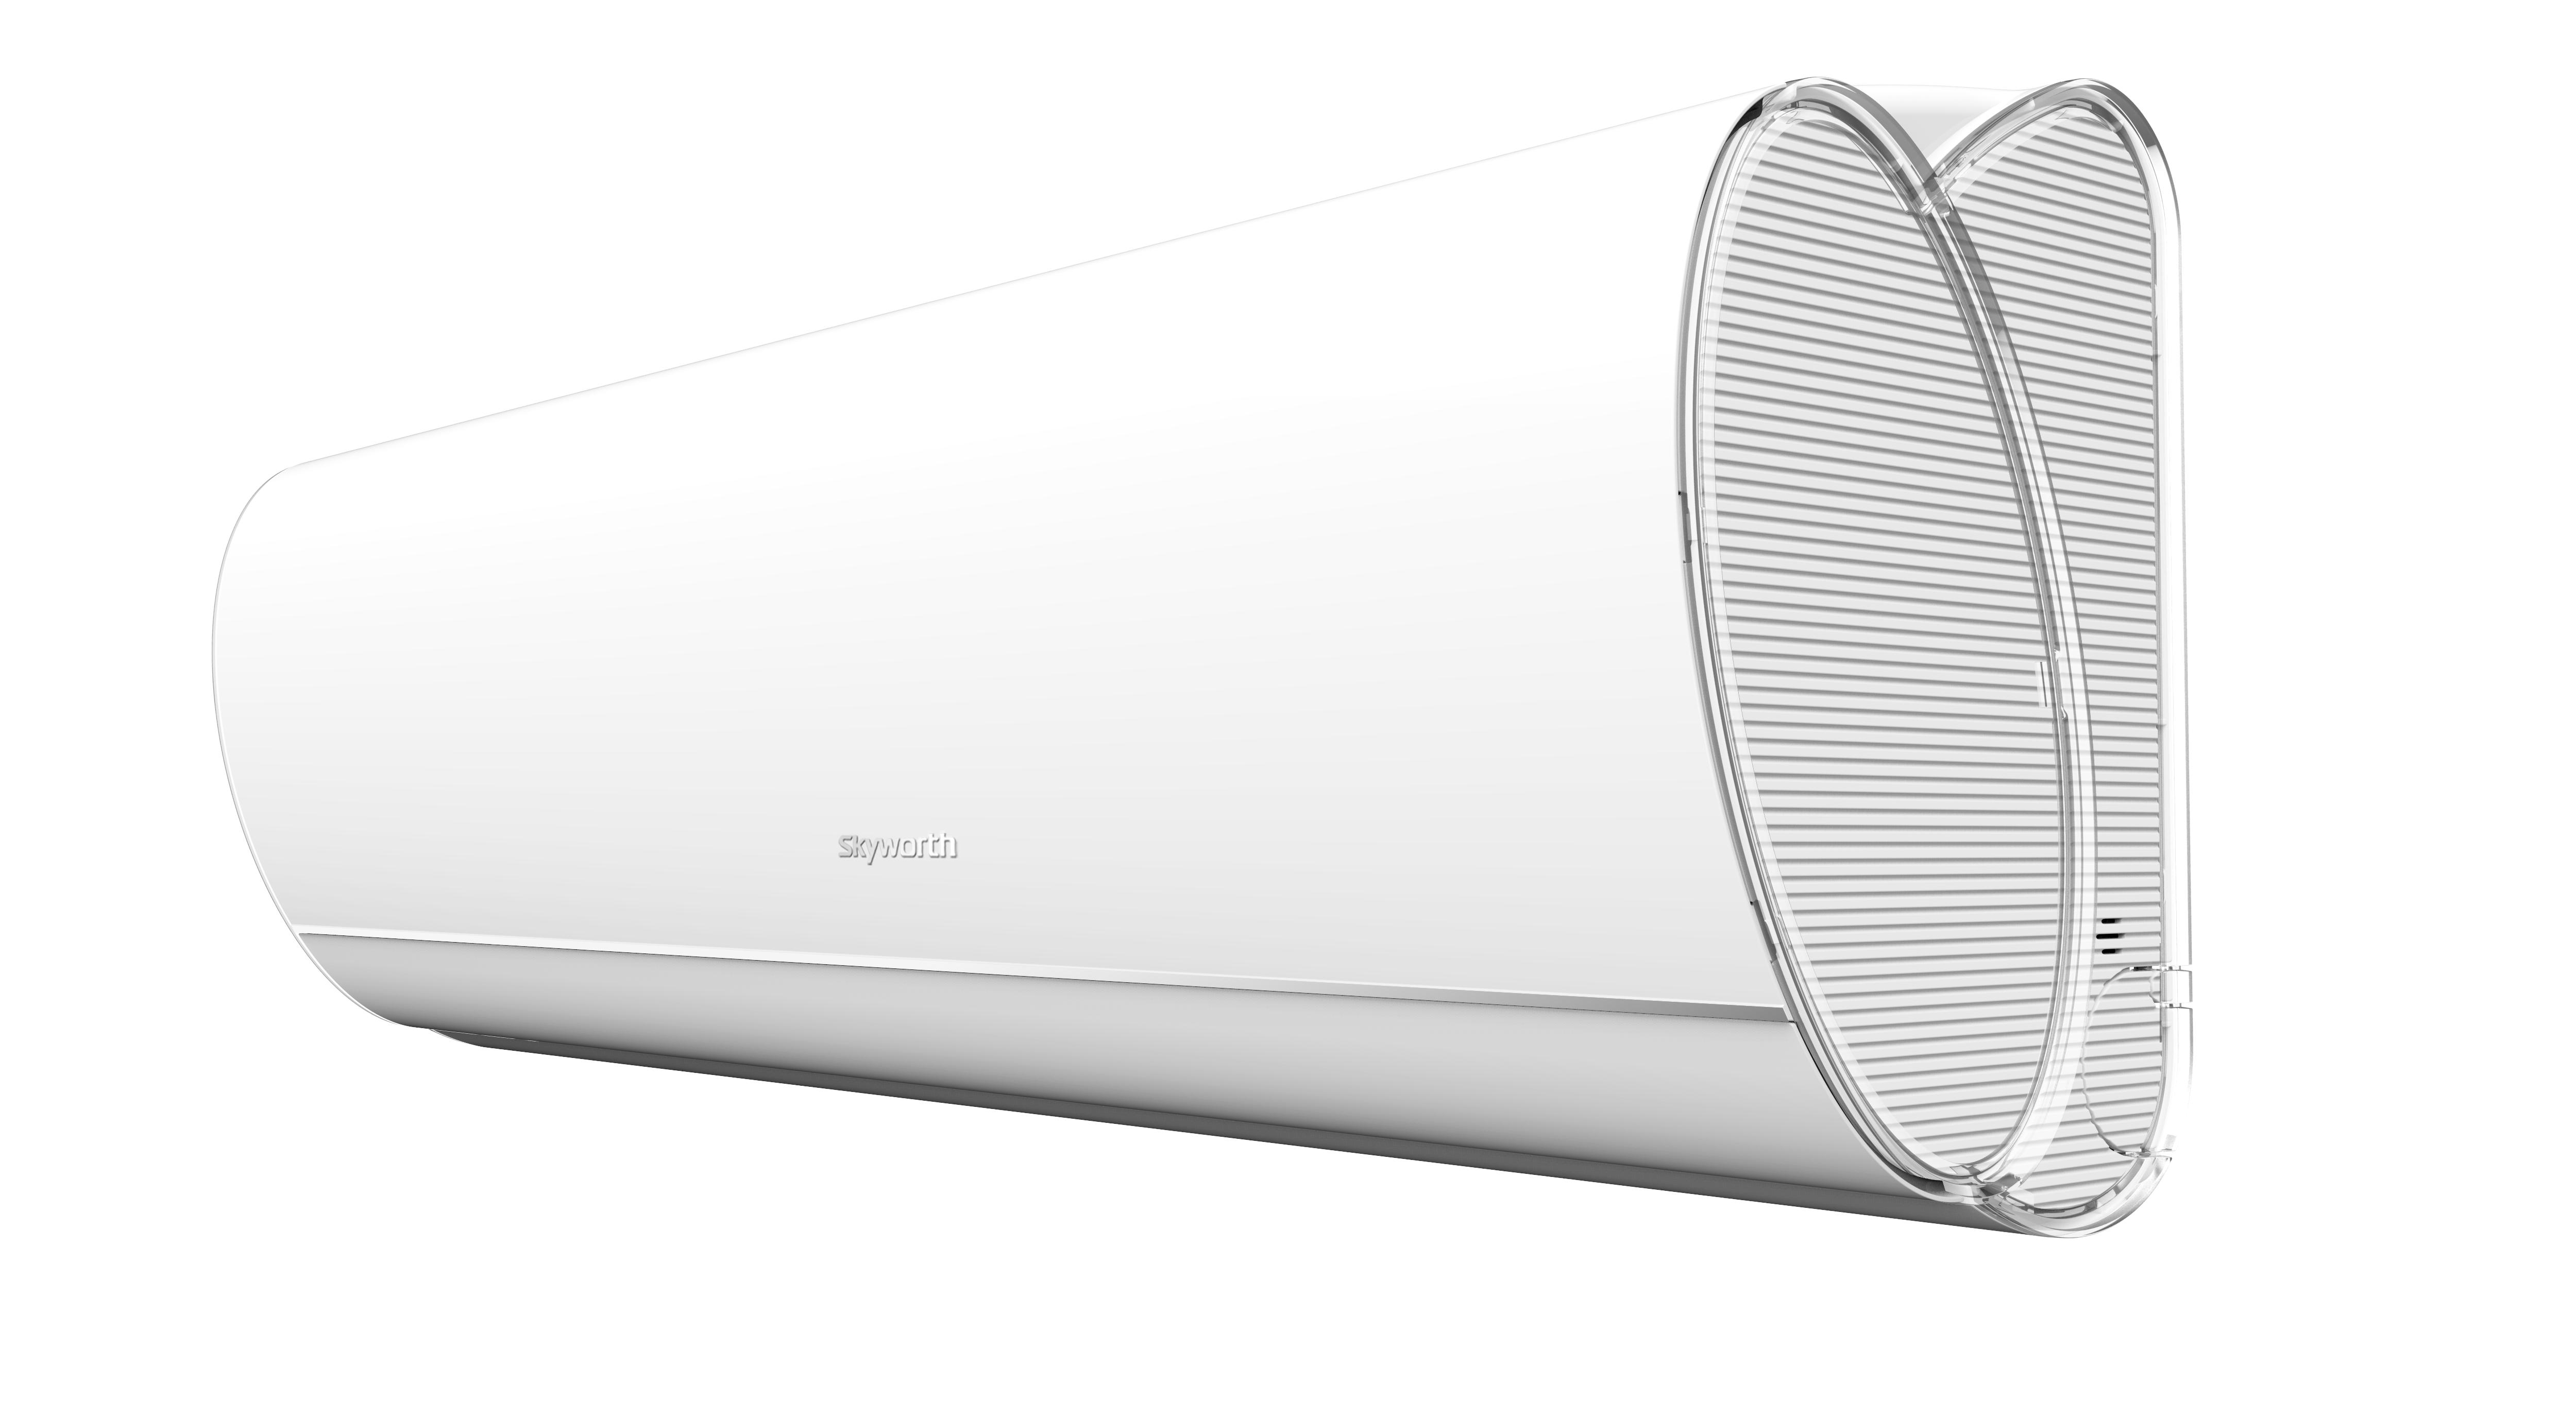 Aparat de aer conditionat tip split Skyworth Nova, Inverter, A++, R32, WiFi incorporat 34